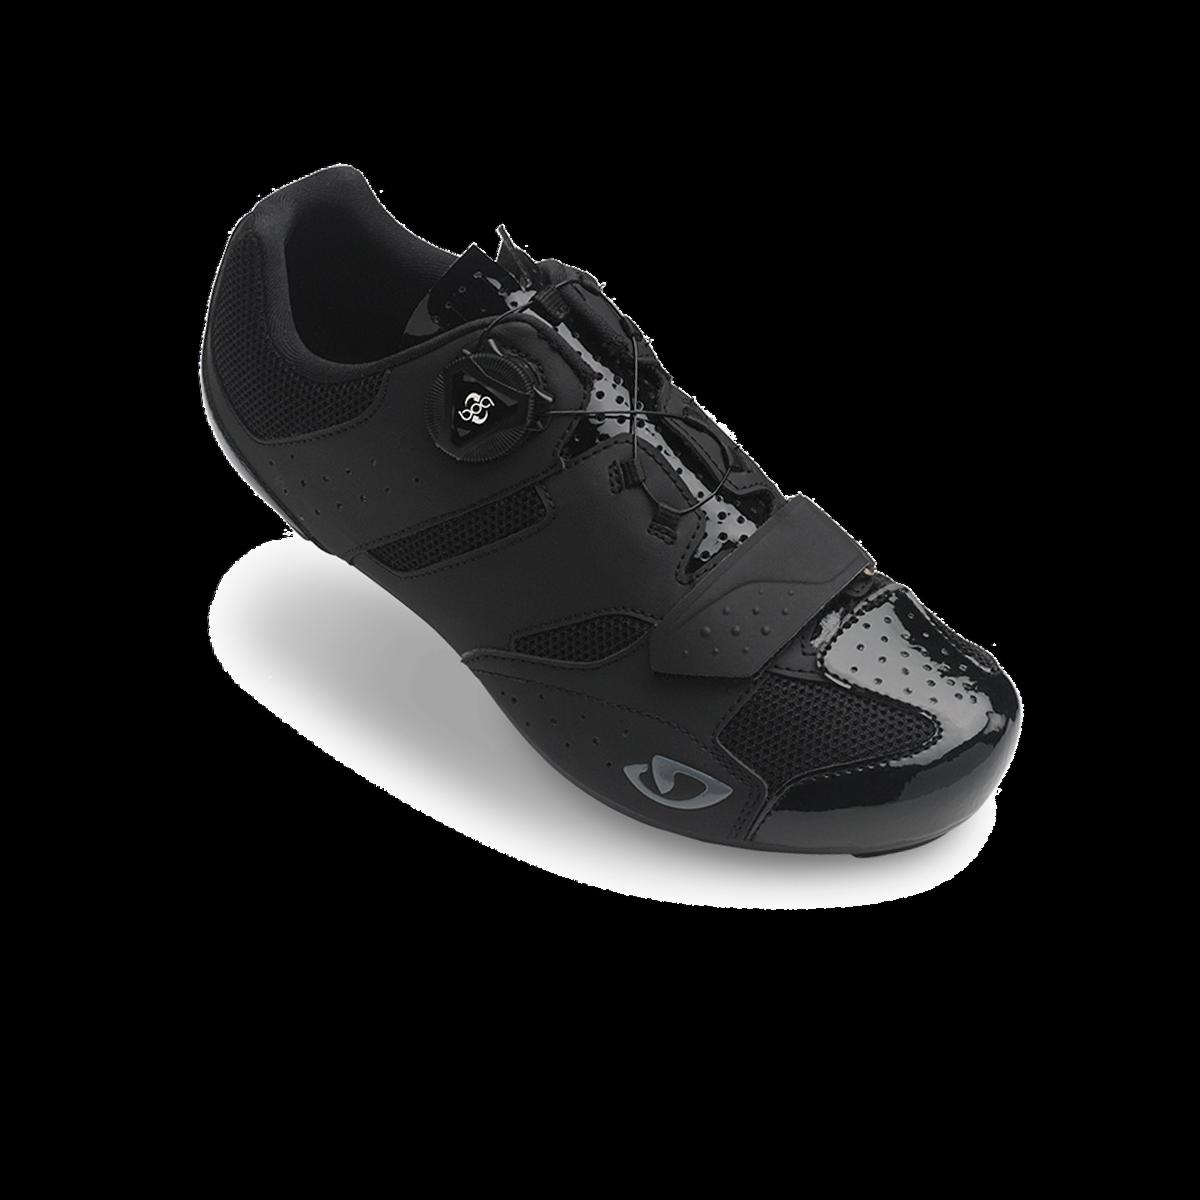 Giro Savix Cyclisme Cyclisme Cyclisme sur route Chaussures 3b34ca